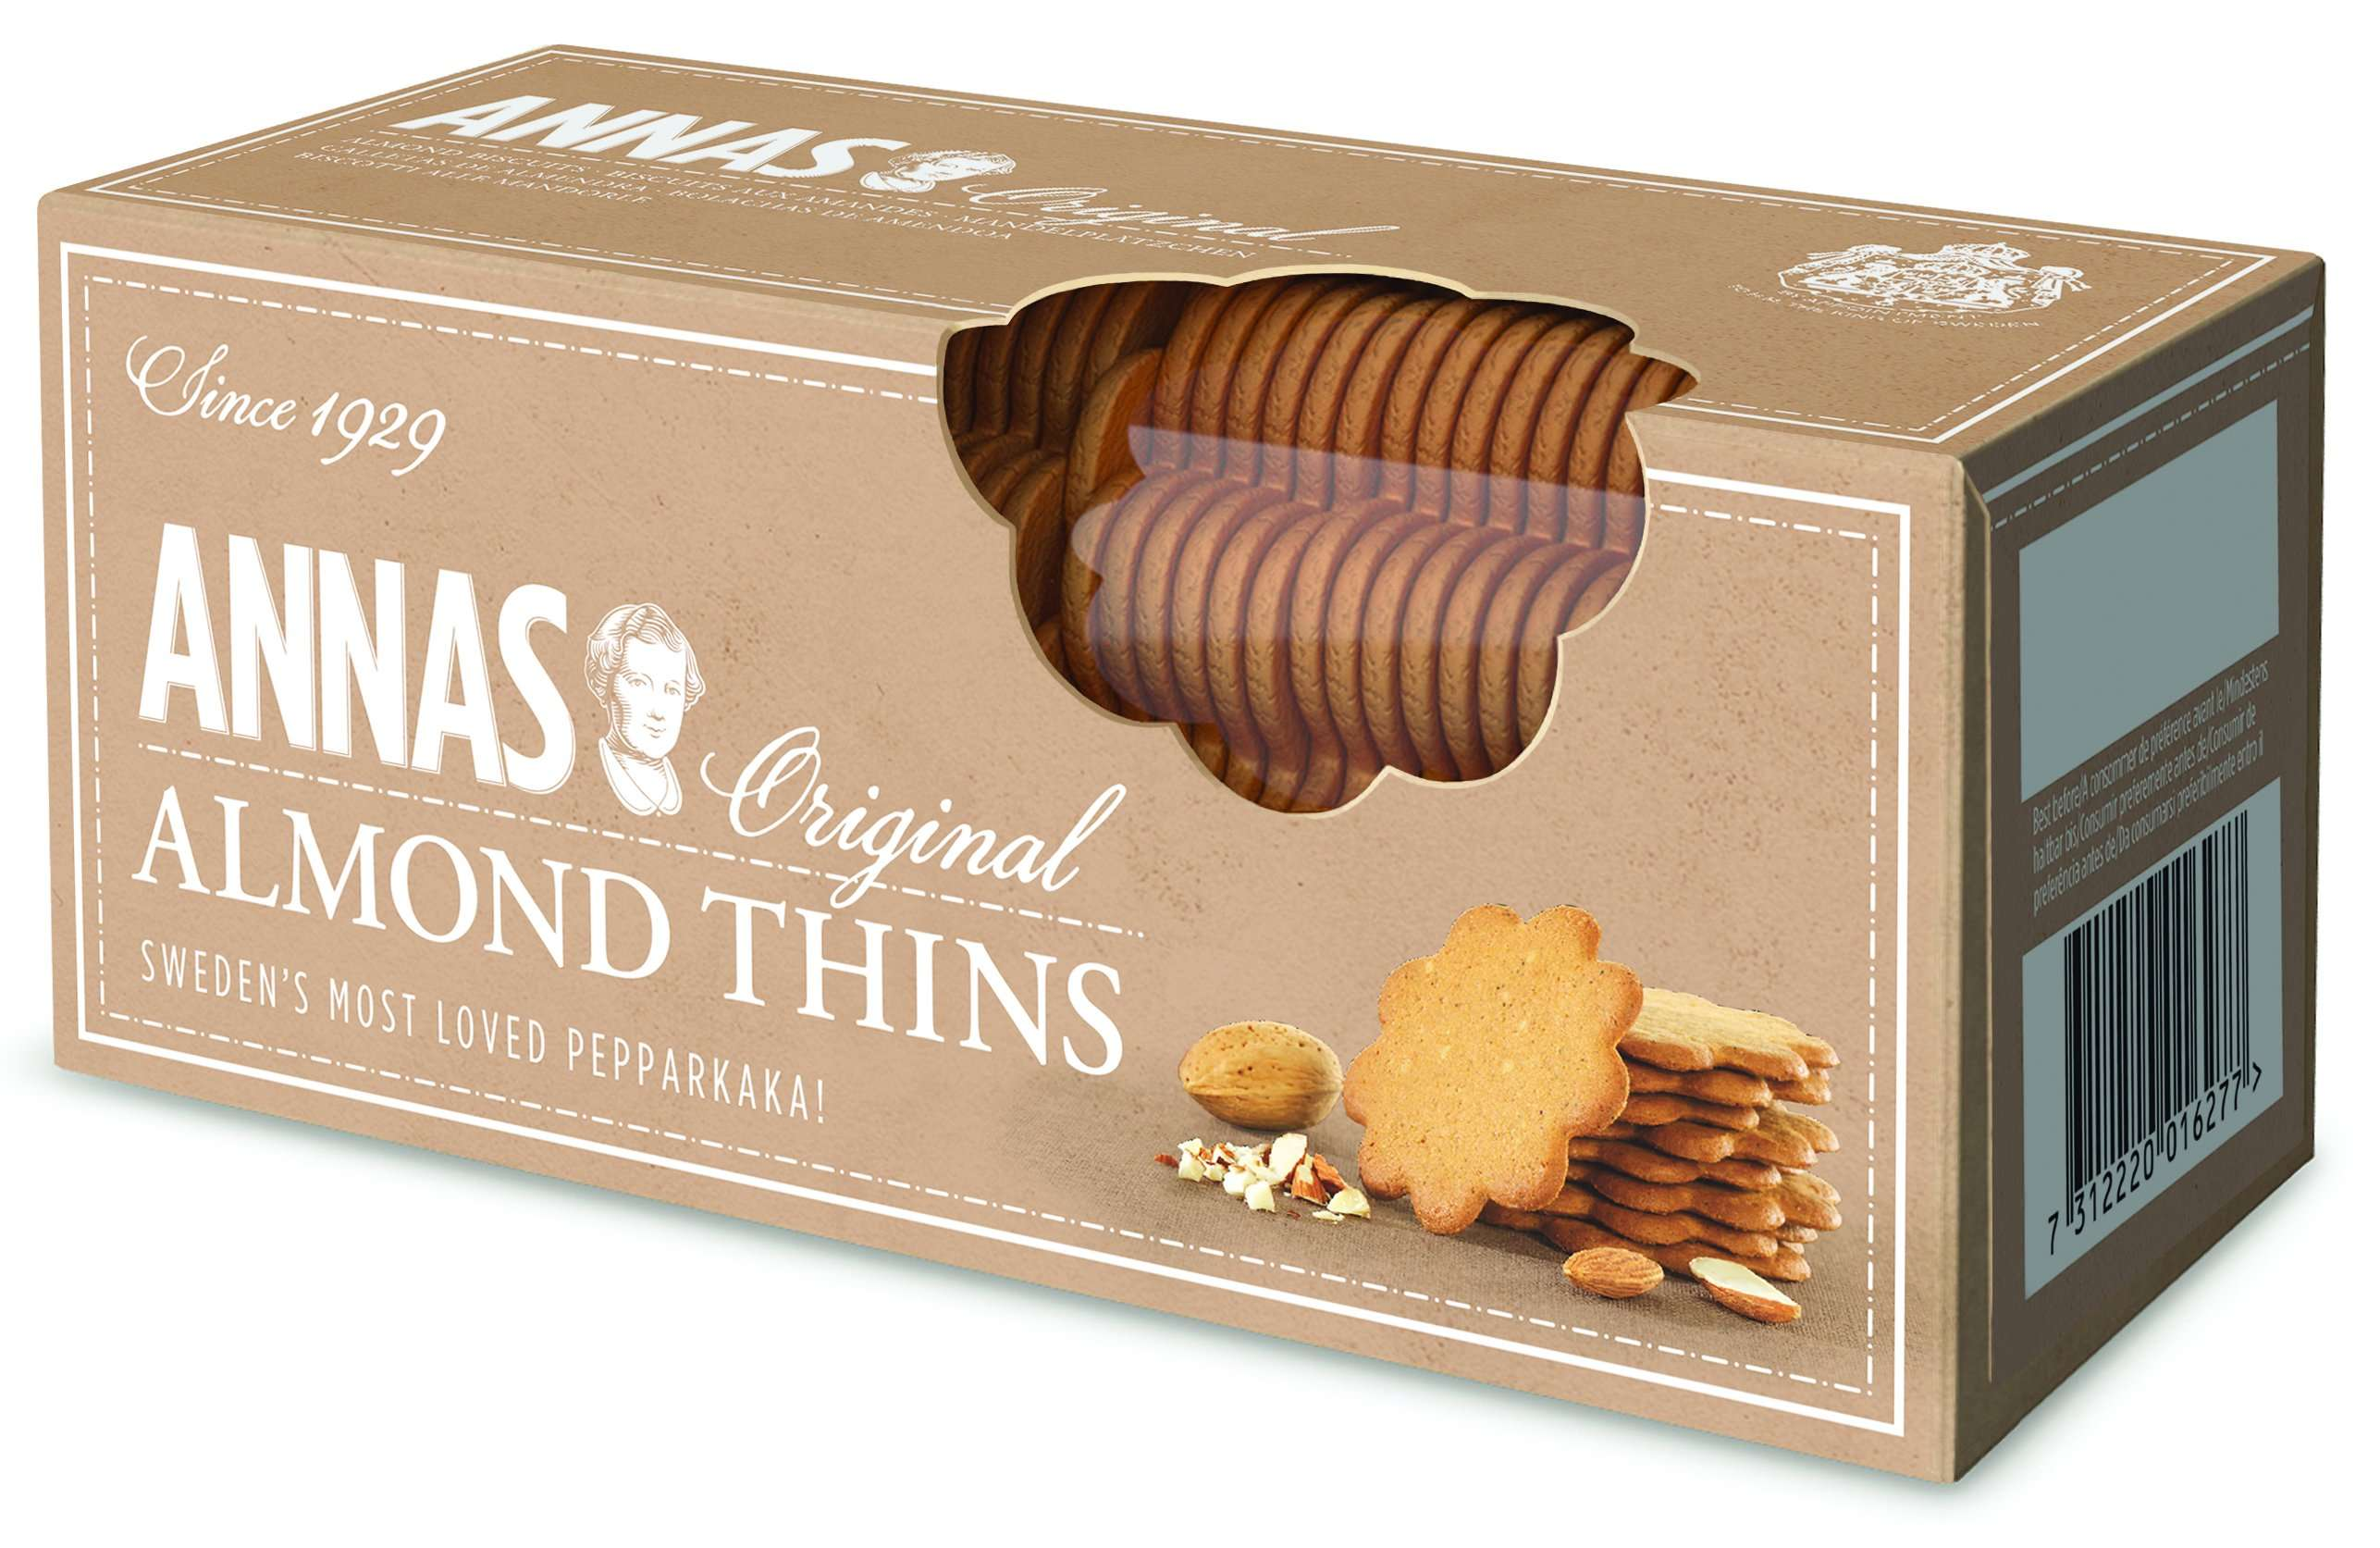 Anna's Almond Thins